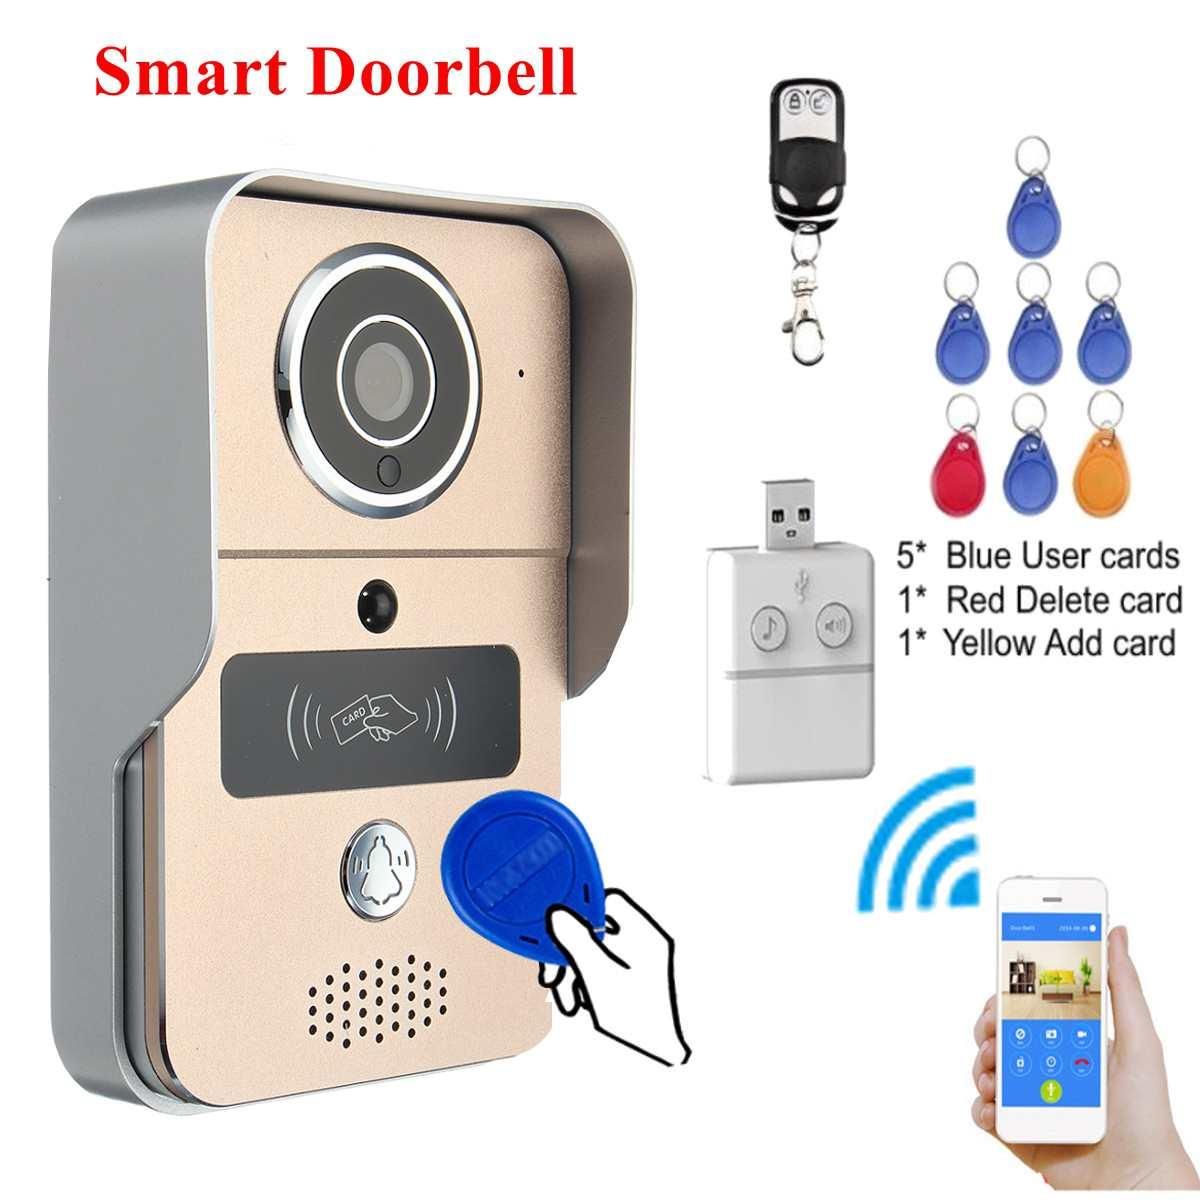 Smart Home Security RFID Smart Doorbell Wifi Wireless Remote Video Phone Home Door Record For